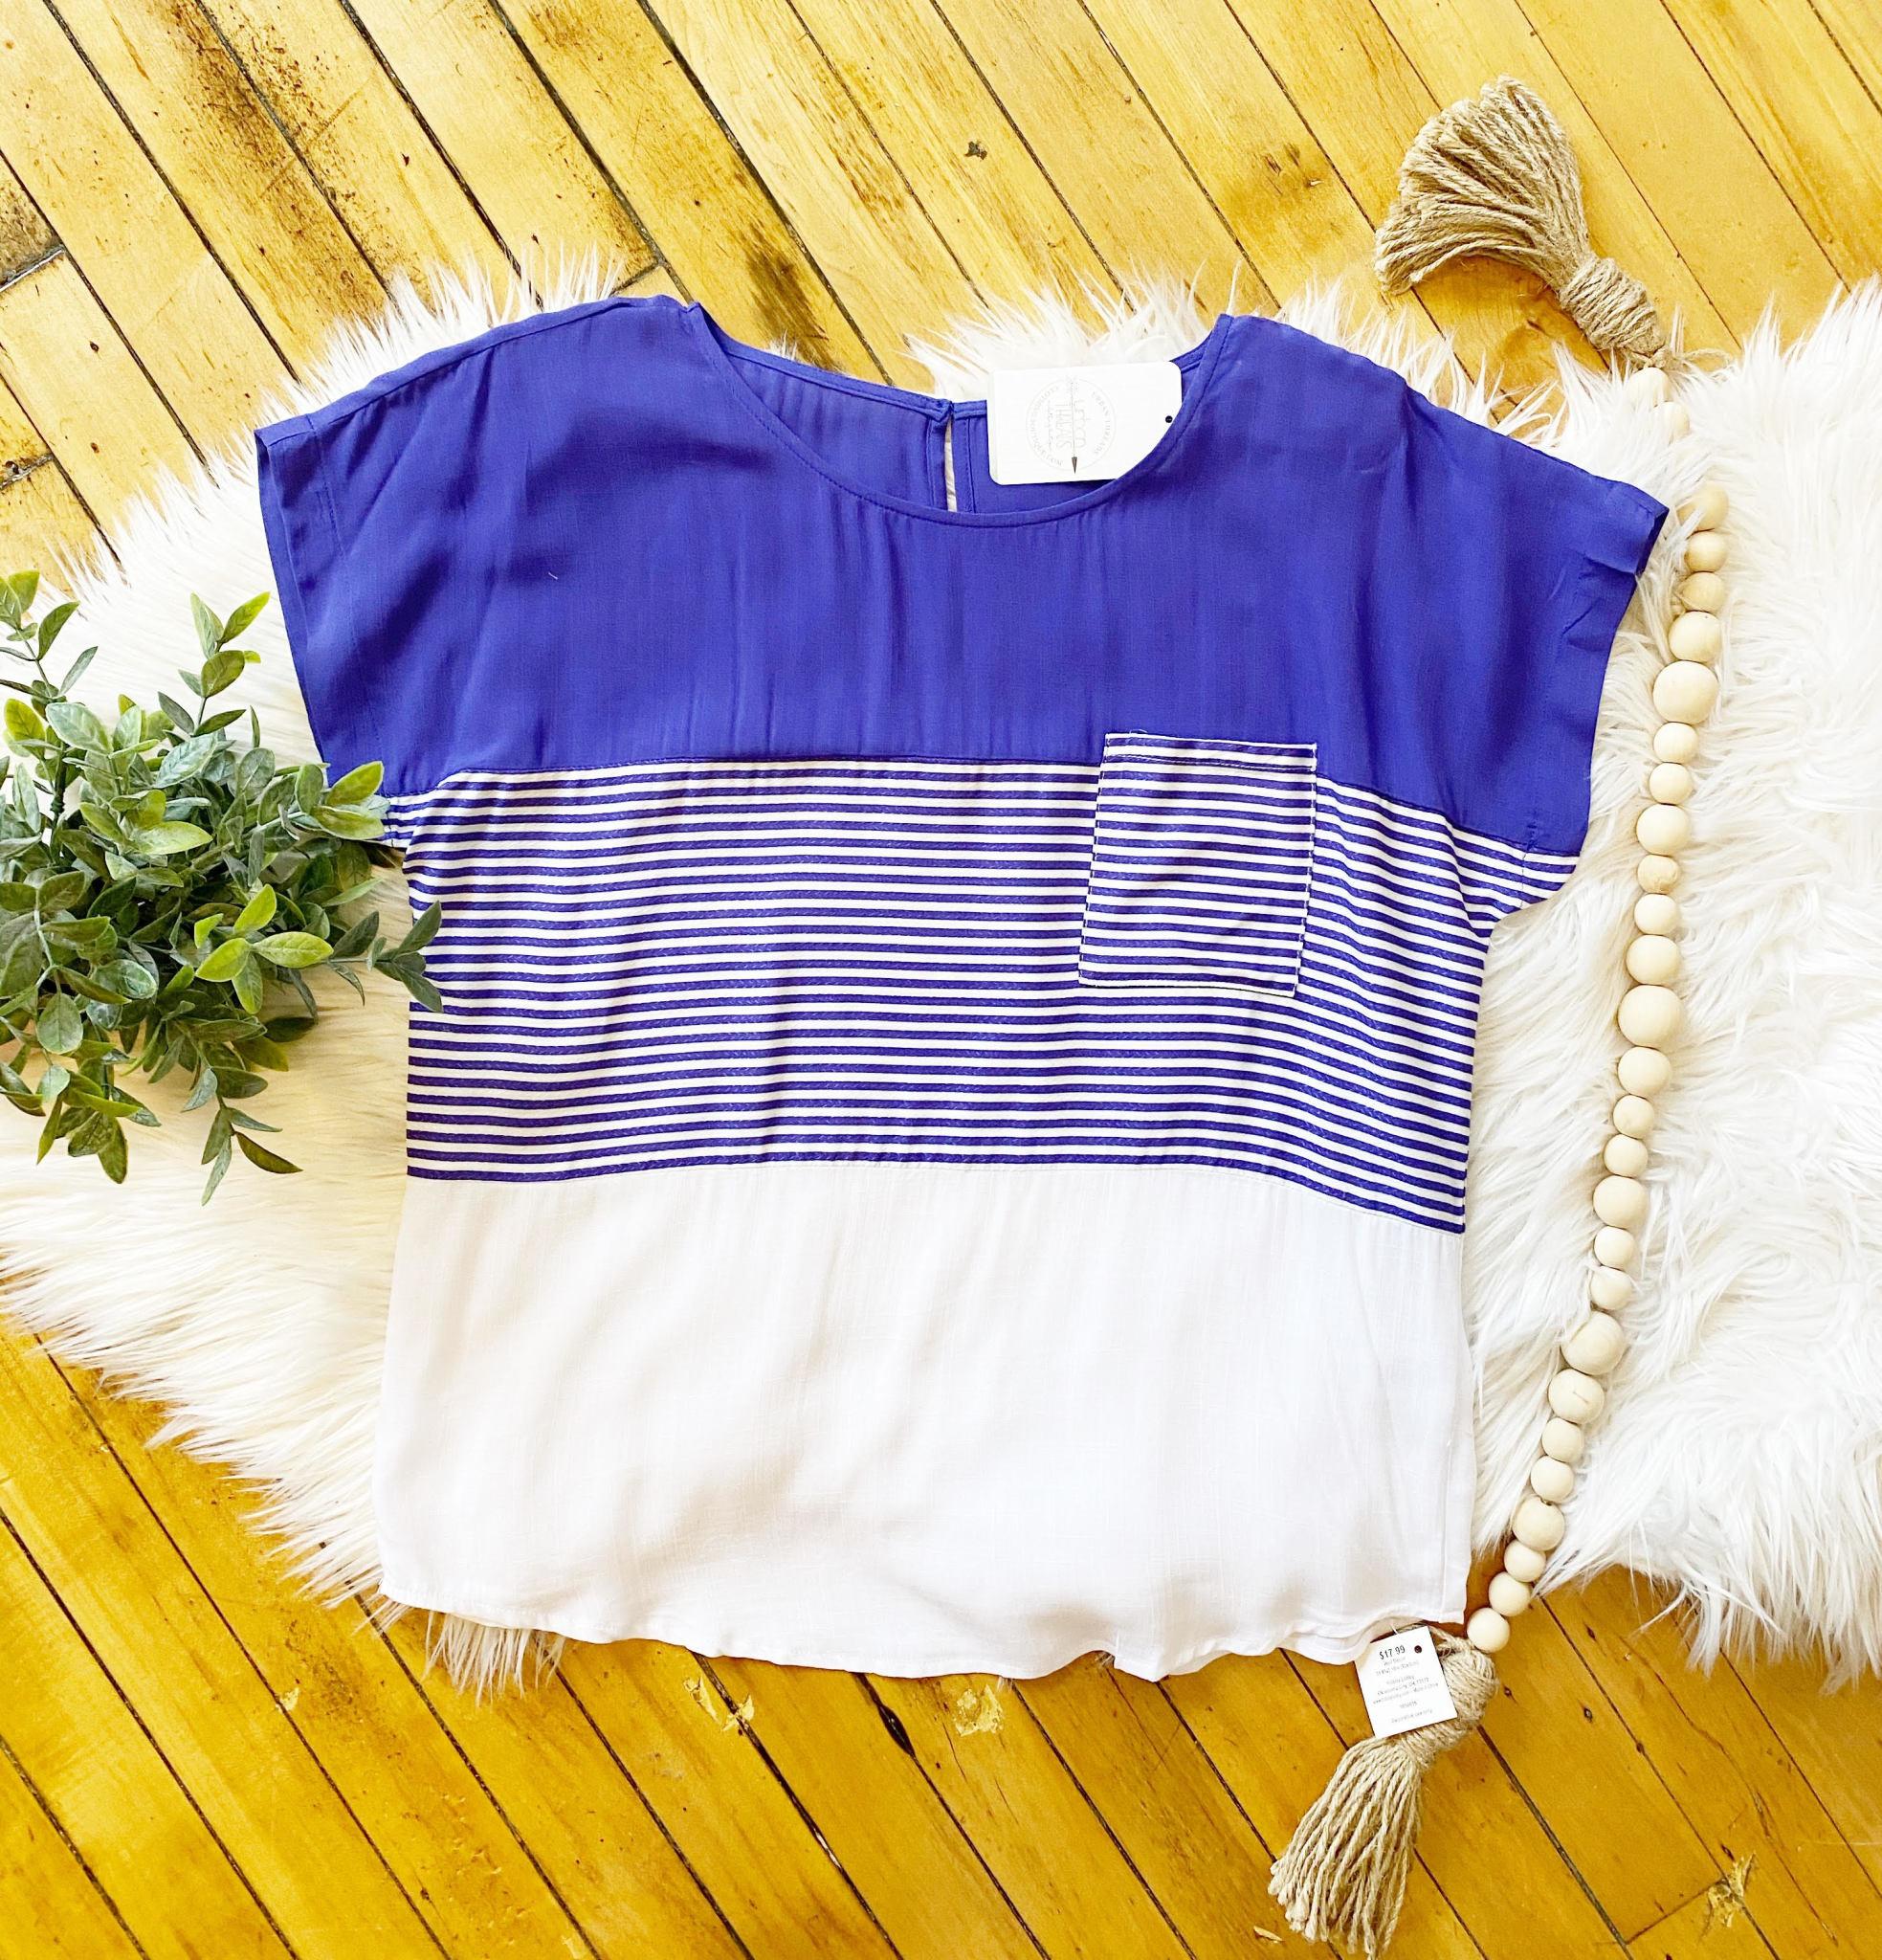 Ava Blue Striped Top